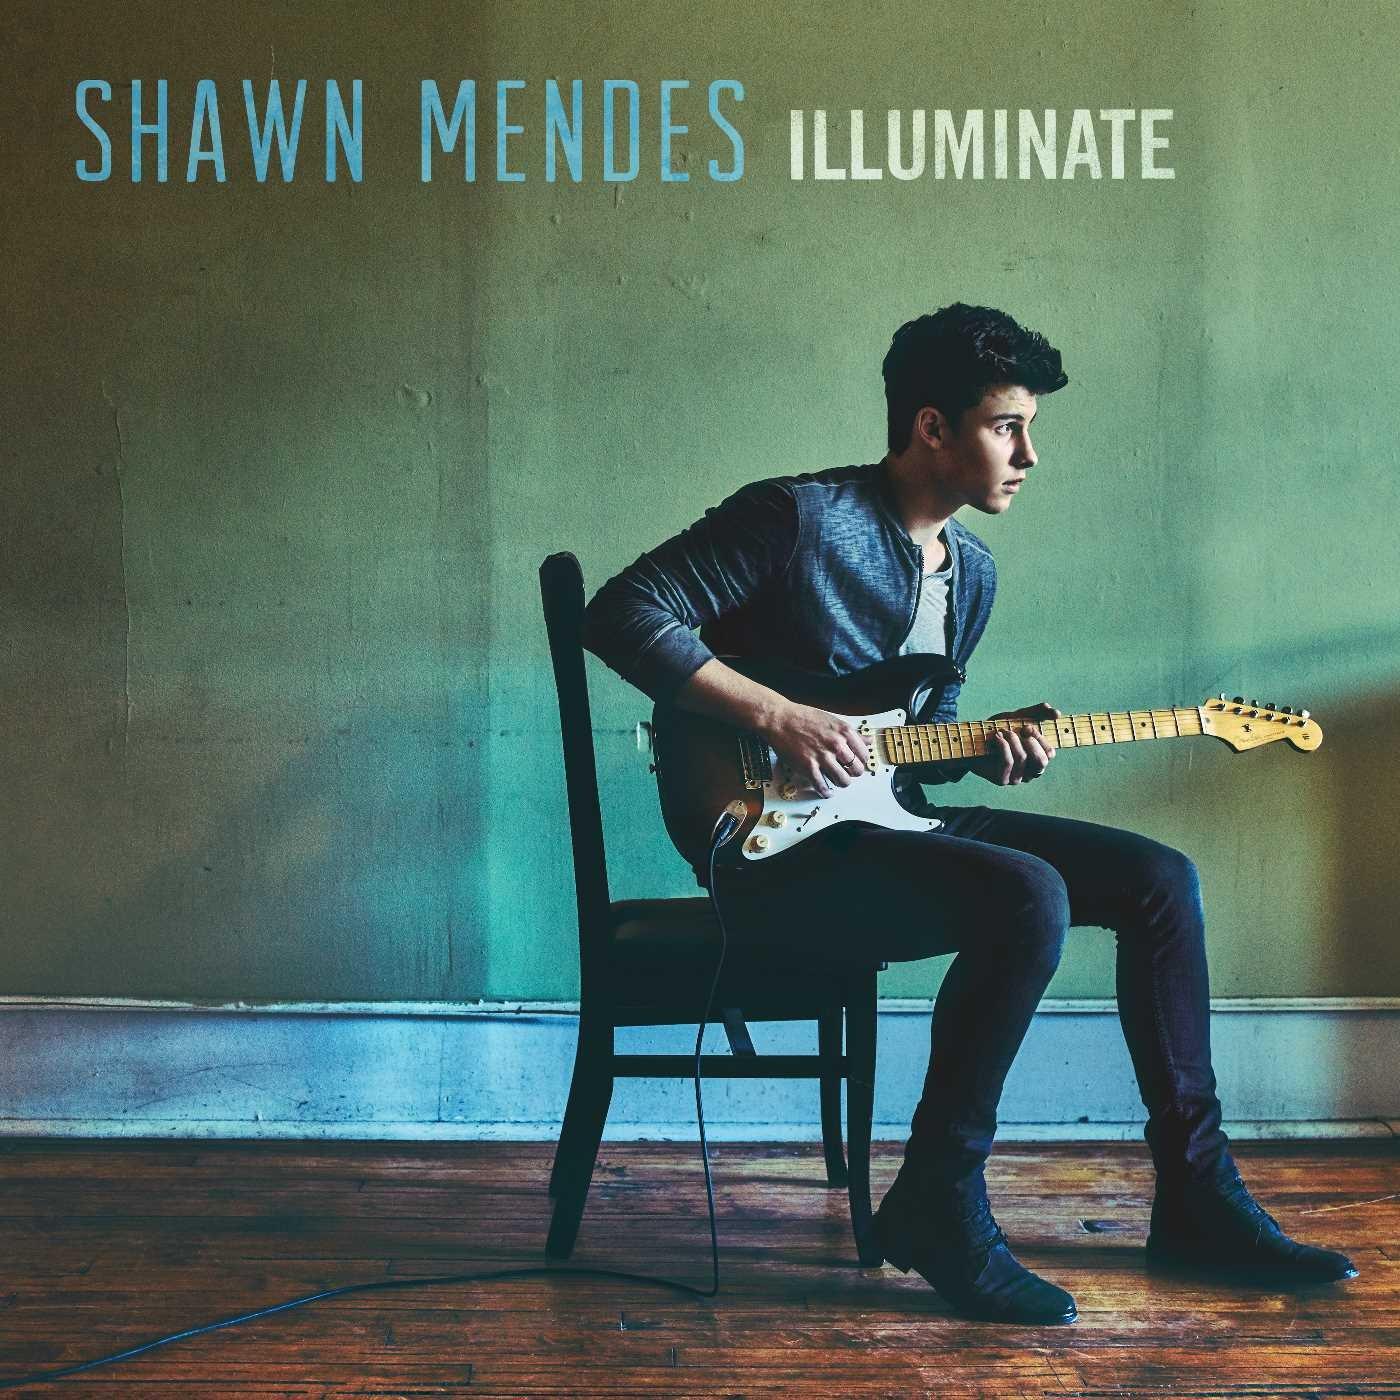 Illuminate [Deluxe Version] by Island